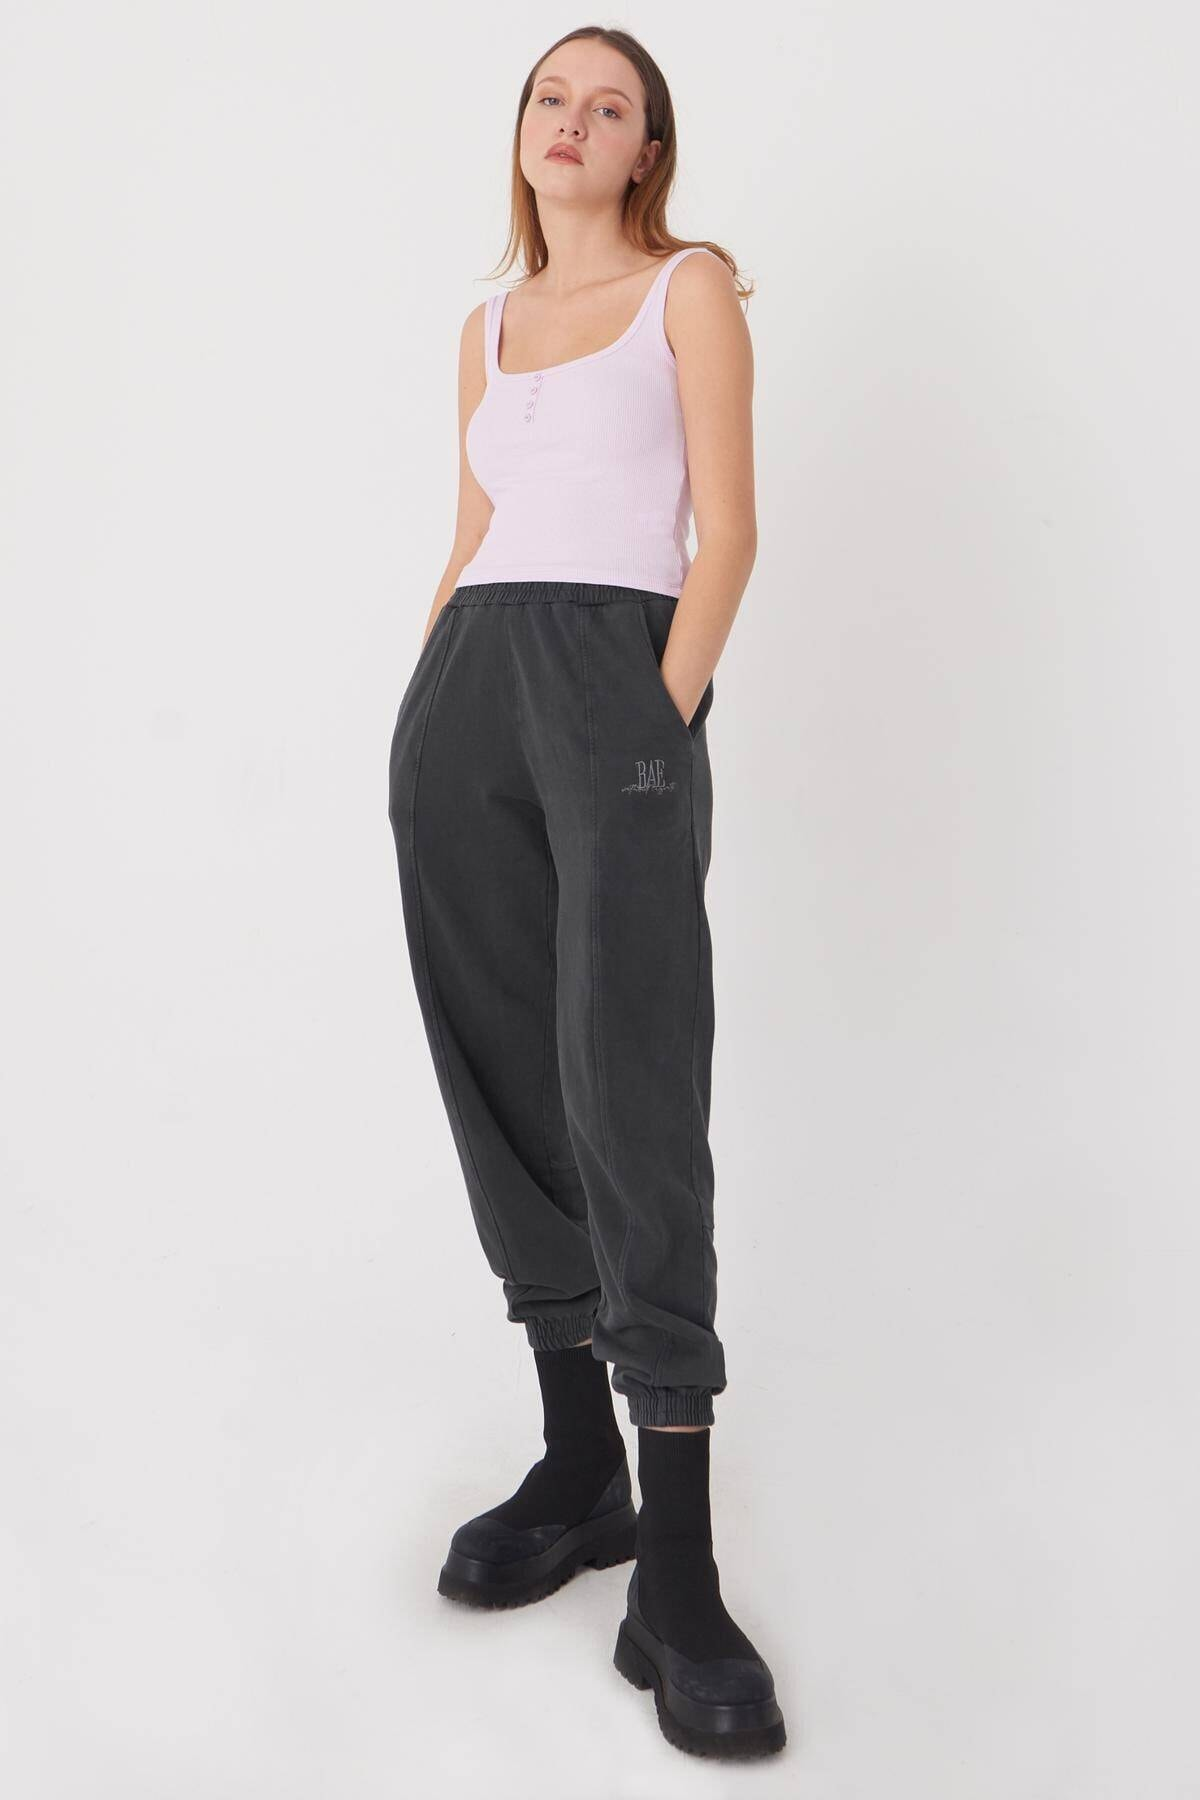 Addax Kadın Açık Lila Askılı Bluz A0963 - Dk11 Adx-0000022397 4